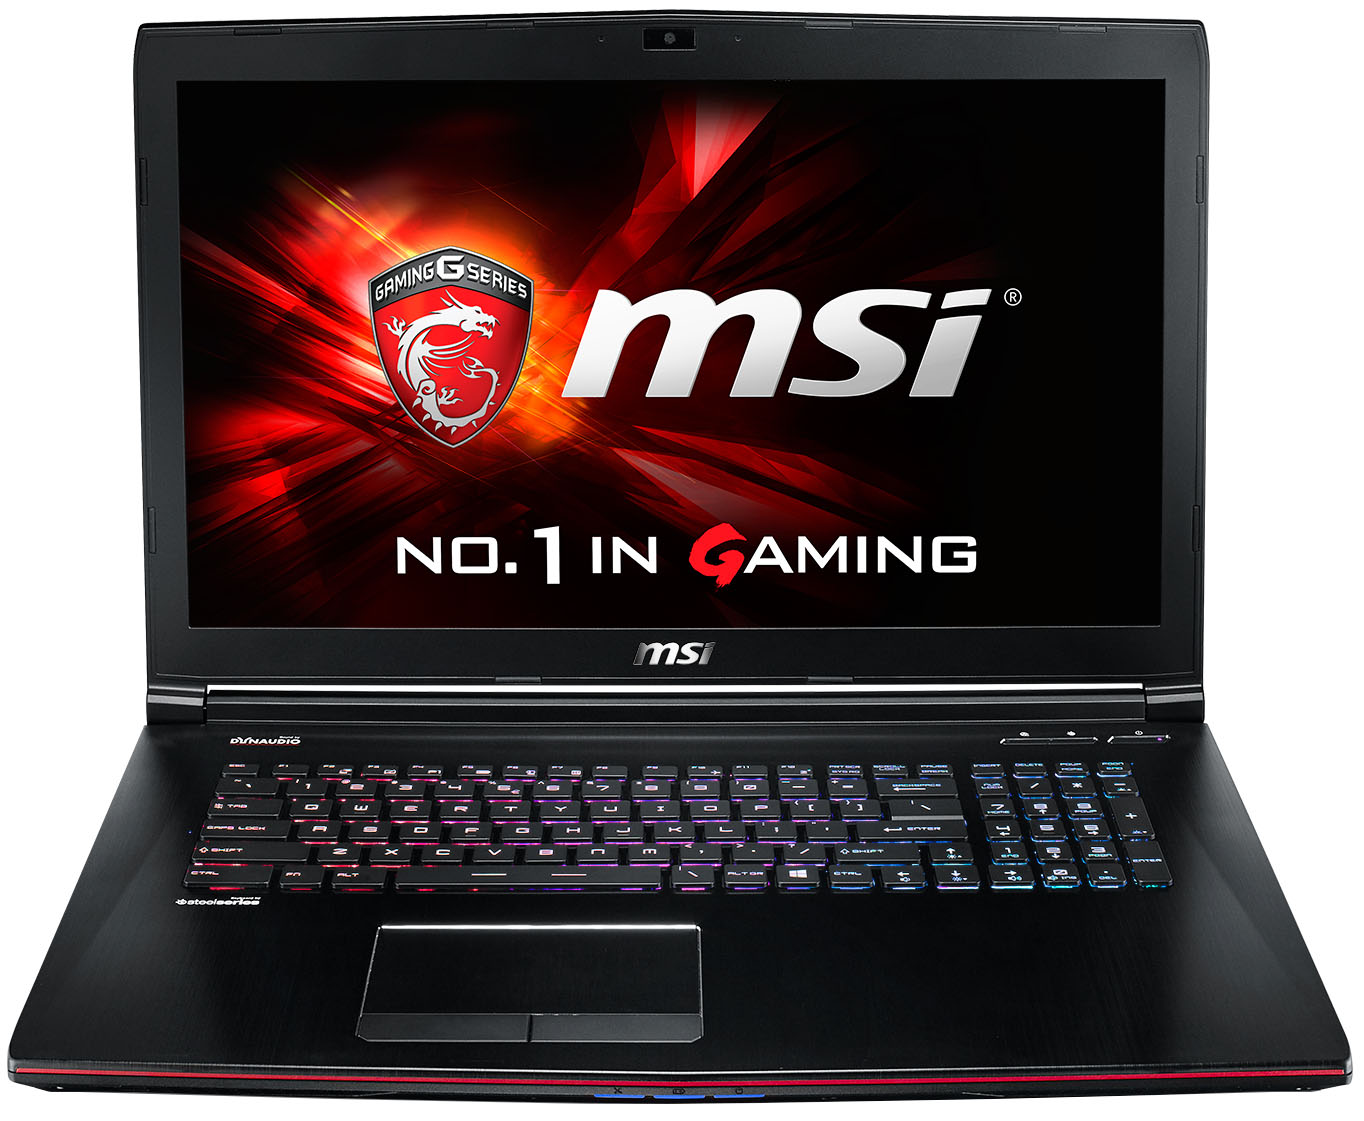 "Ноутбук MSI GE72 2QF Apache Pro MS-1791 17.3"", Intel Core i7-5700HQ 2.7GHz, 16Gb, 1000Gb HDD, DOS (9S7-179111-212)"